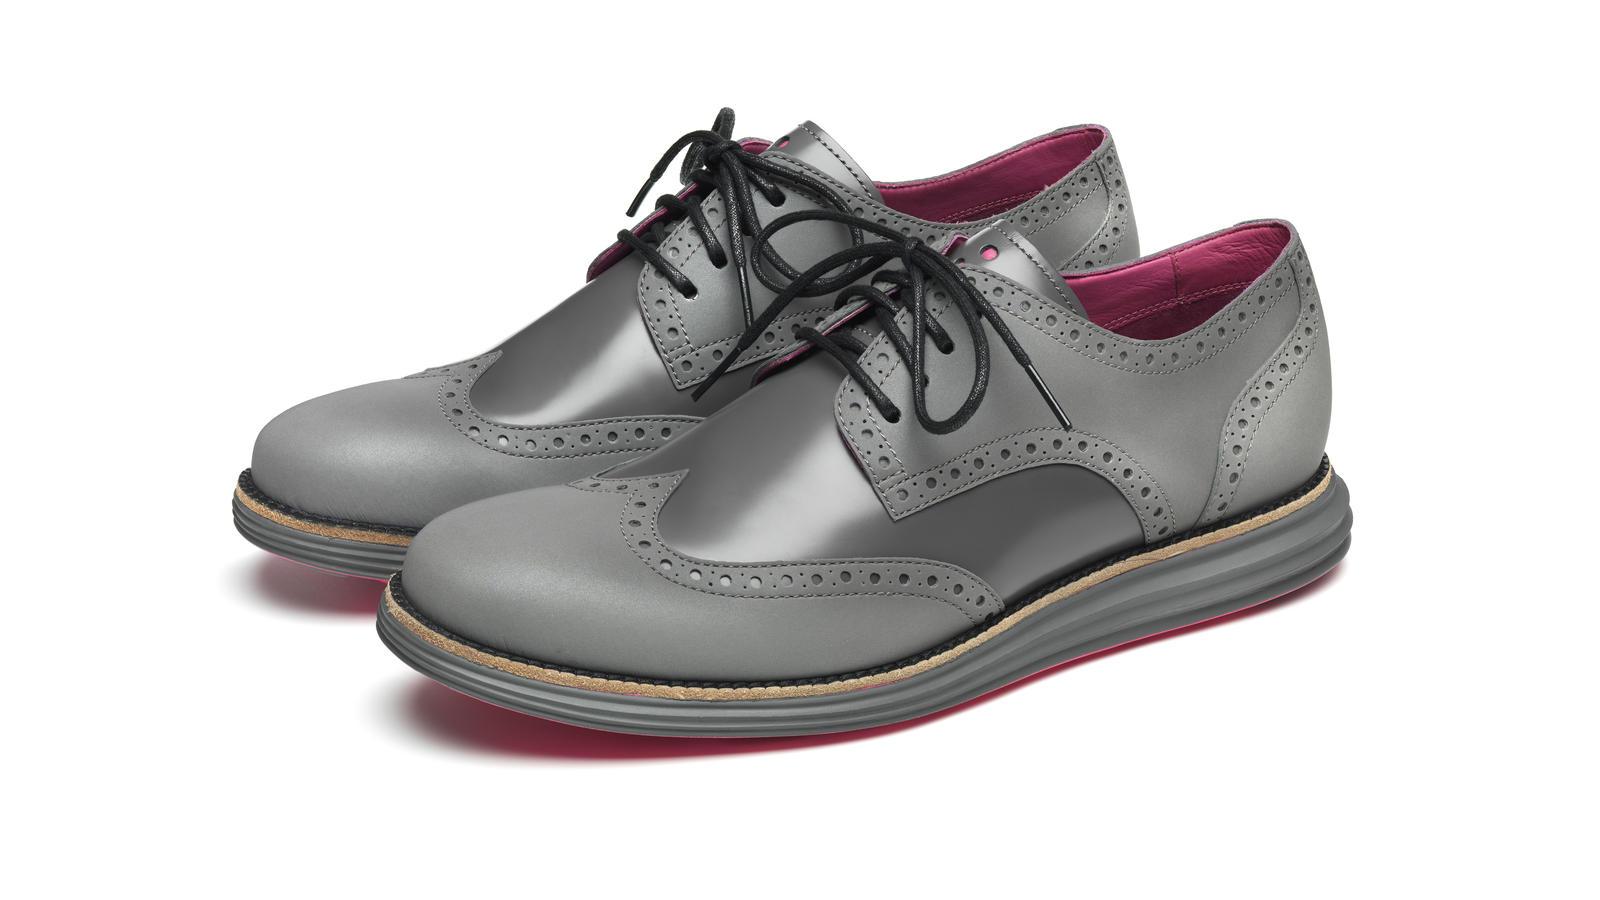 cole haan shoes polish pngisd football 718110